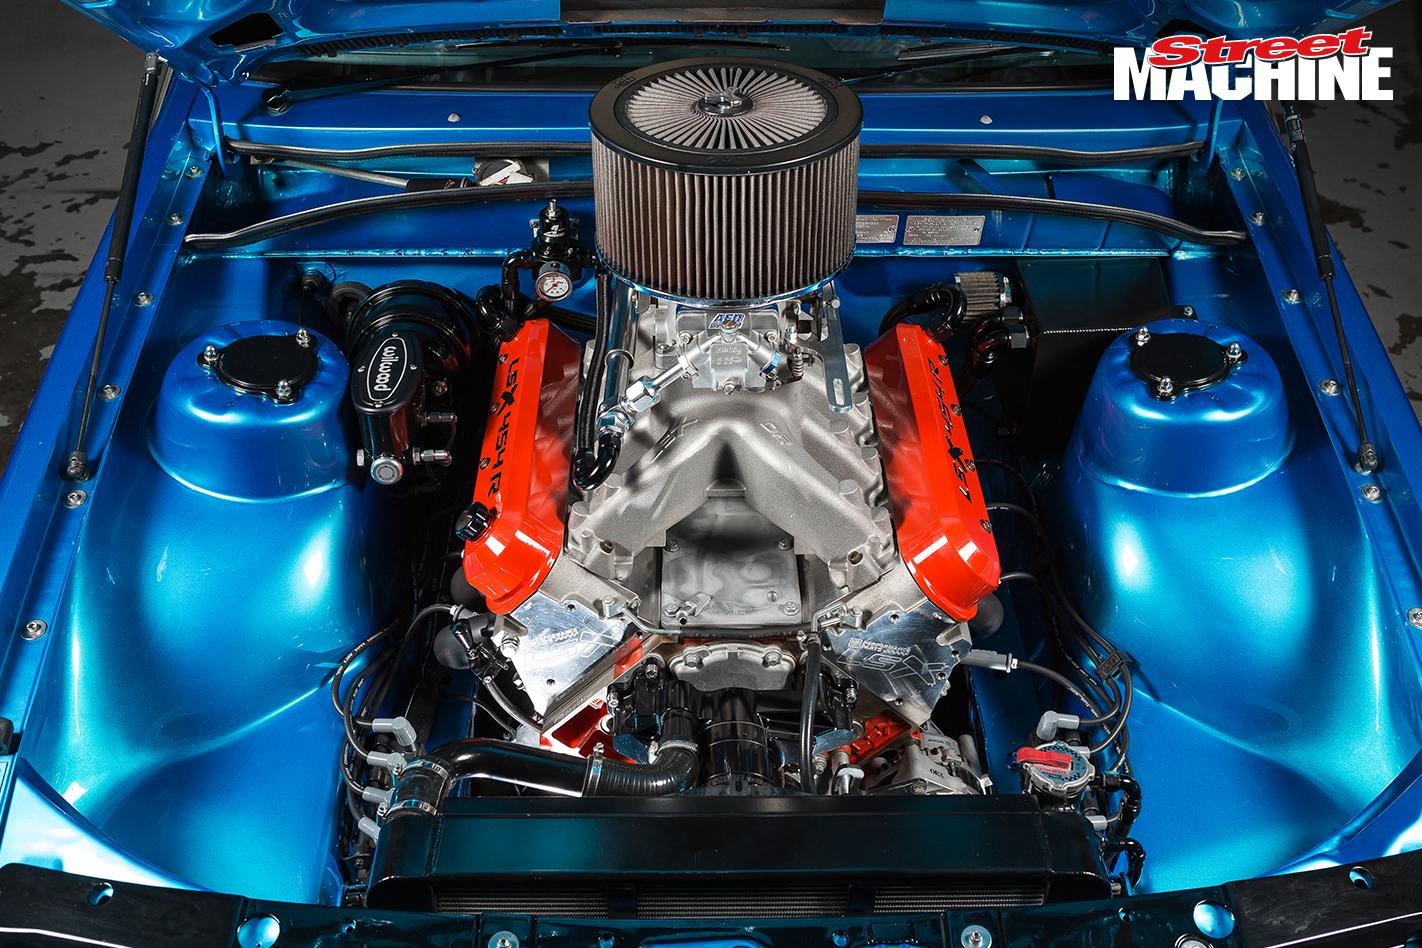 LSX454R-powered Holden VL Calais- ufcnancy.info on ls1 ignition wire terminals, ls1 swap harness, ls1 fuel line, 68 camaro ls1 wire harness, ls1 power steering pump, ls1 oil cooler, ls1 fuel pressure regulator, ls1 pulley, ls1 brakes, ls1 engine harness, ls1 fuel filter, ls1 exhaust, ls1 fuel rail, ls1 wheels, stock ls1 harness, 2000 ls1 harness, custom ls1 harness, ls1 carburetor, ls1 driveshaft,